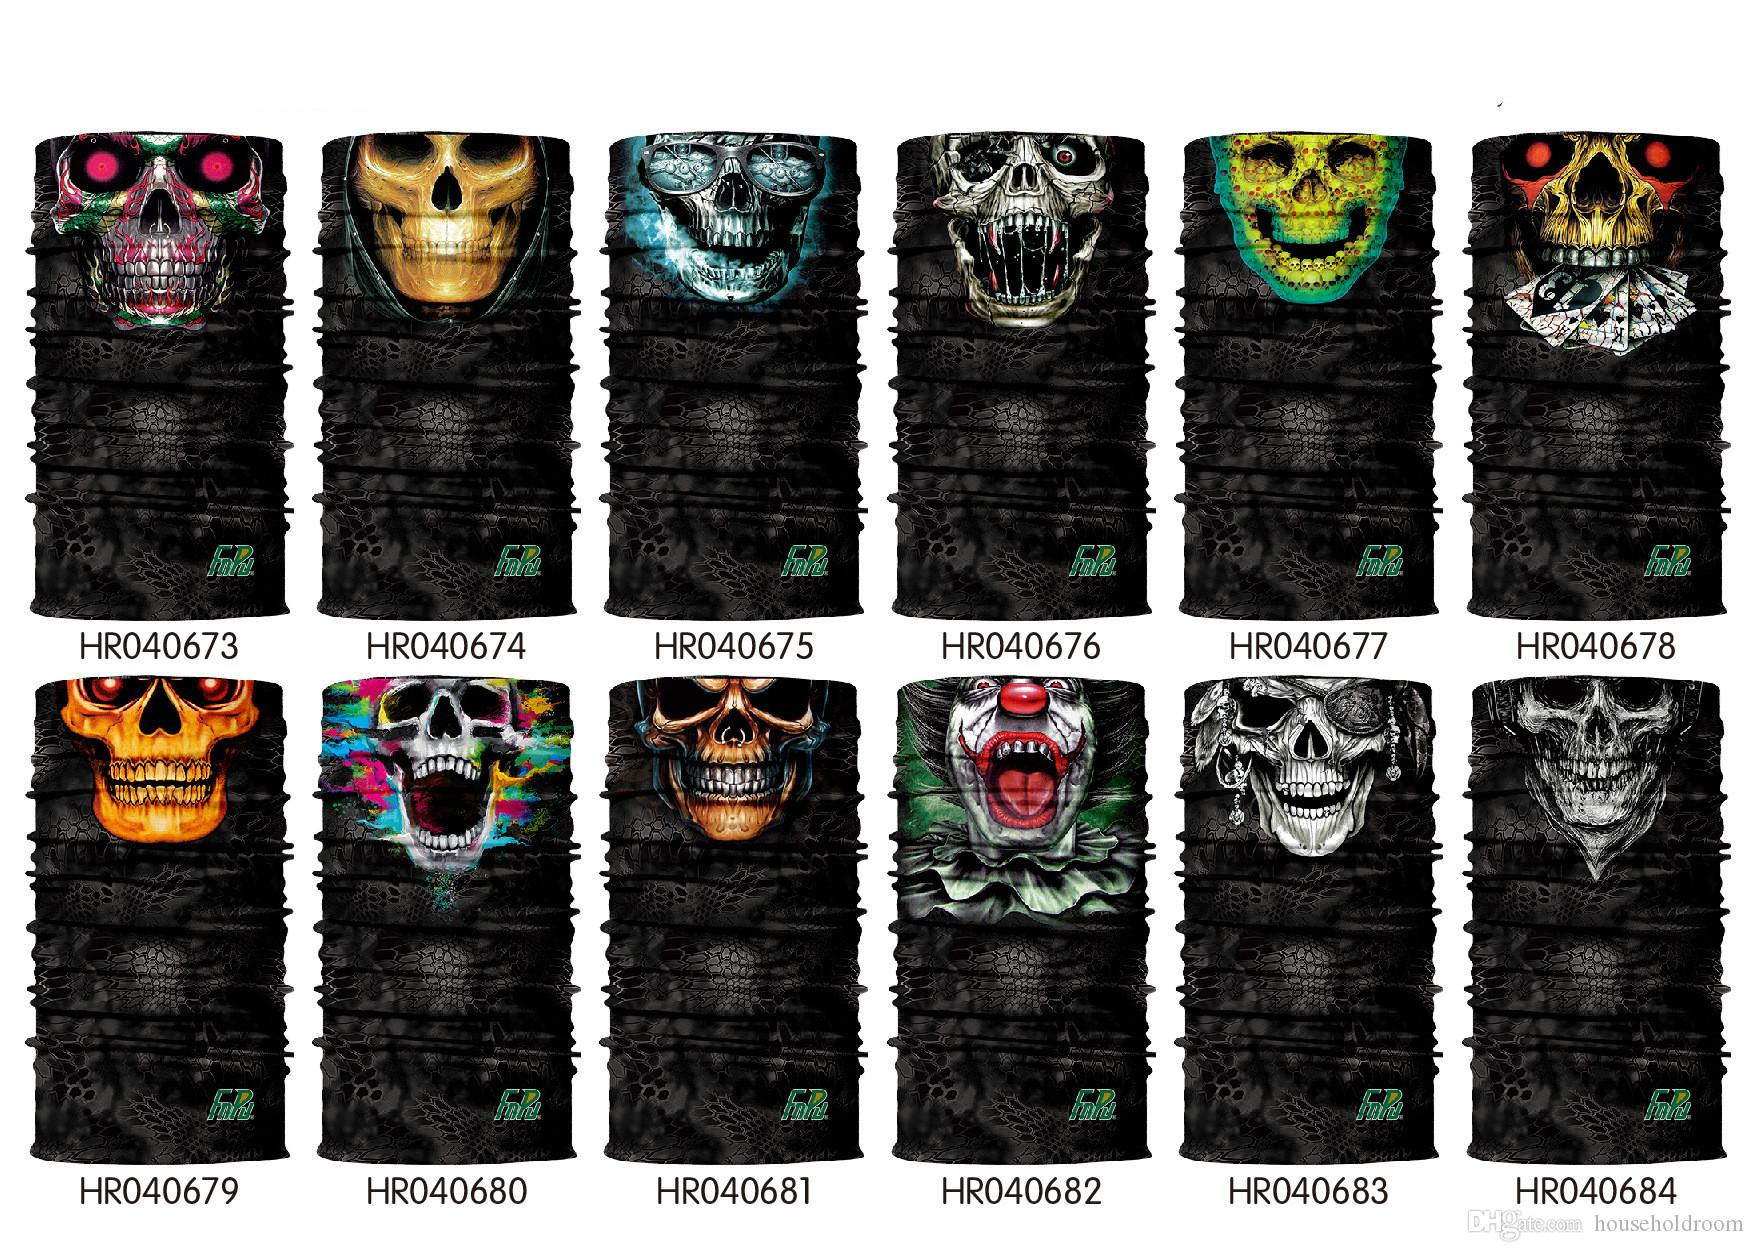 Design Skull Multi Function Bandana Ski Sport Motard Écharpe Masques visage extérieur masque facial Bandeau Neck Gaiter